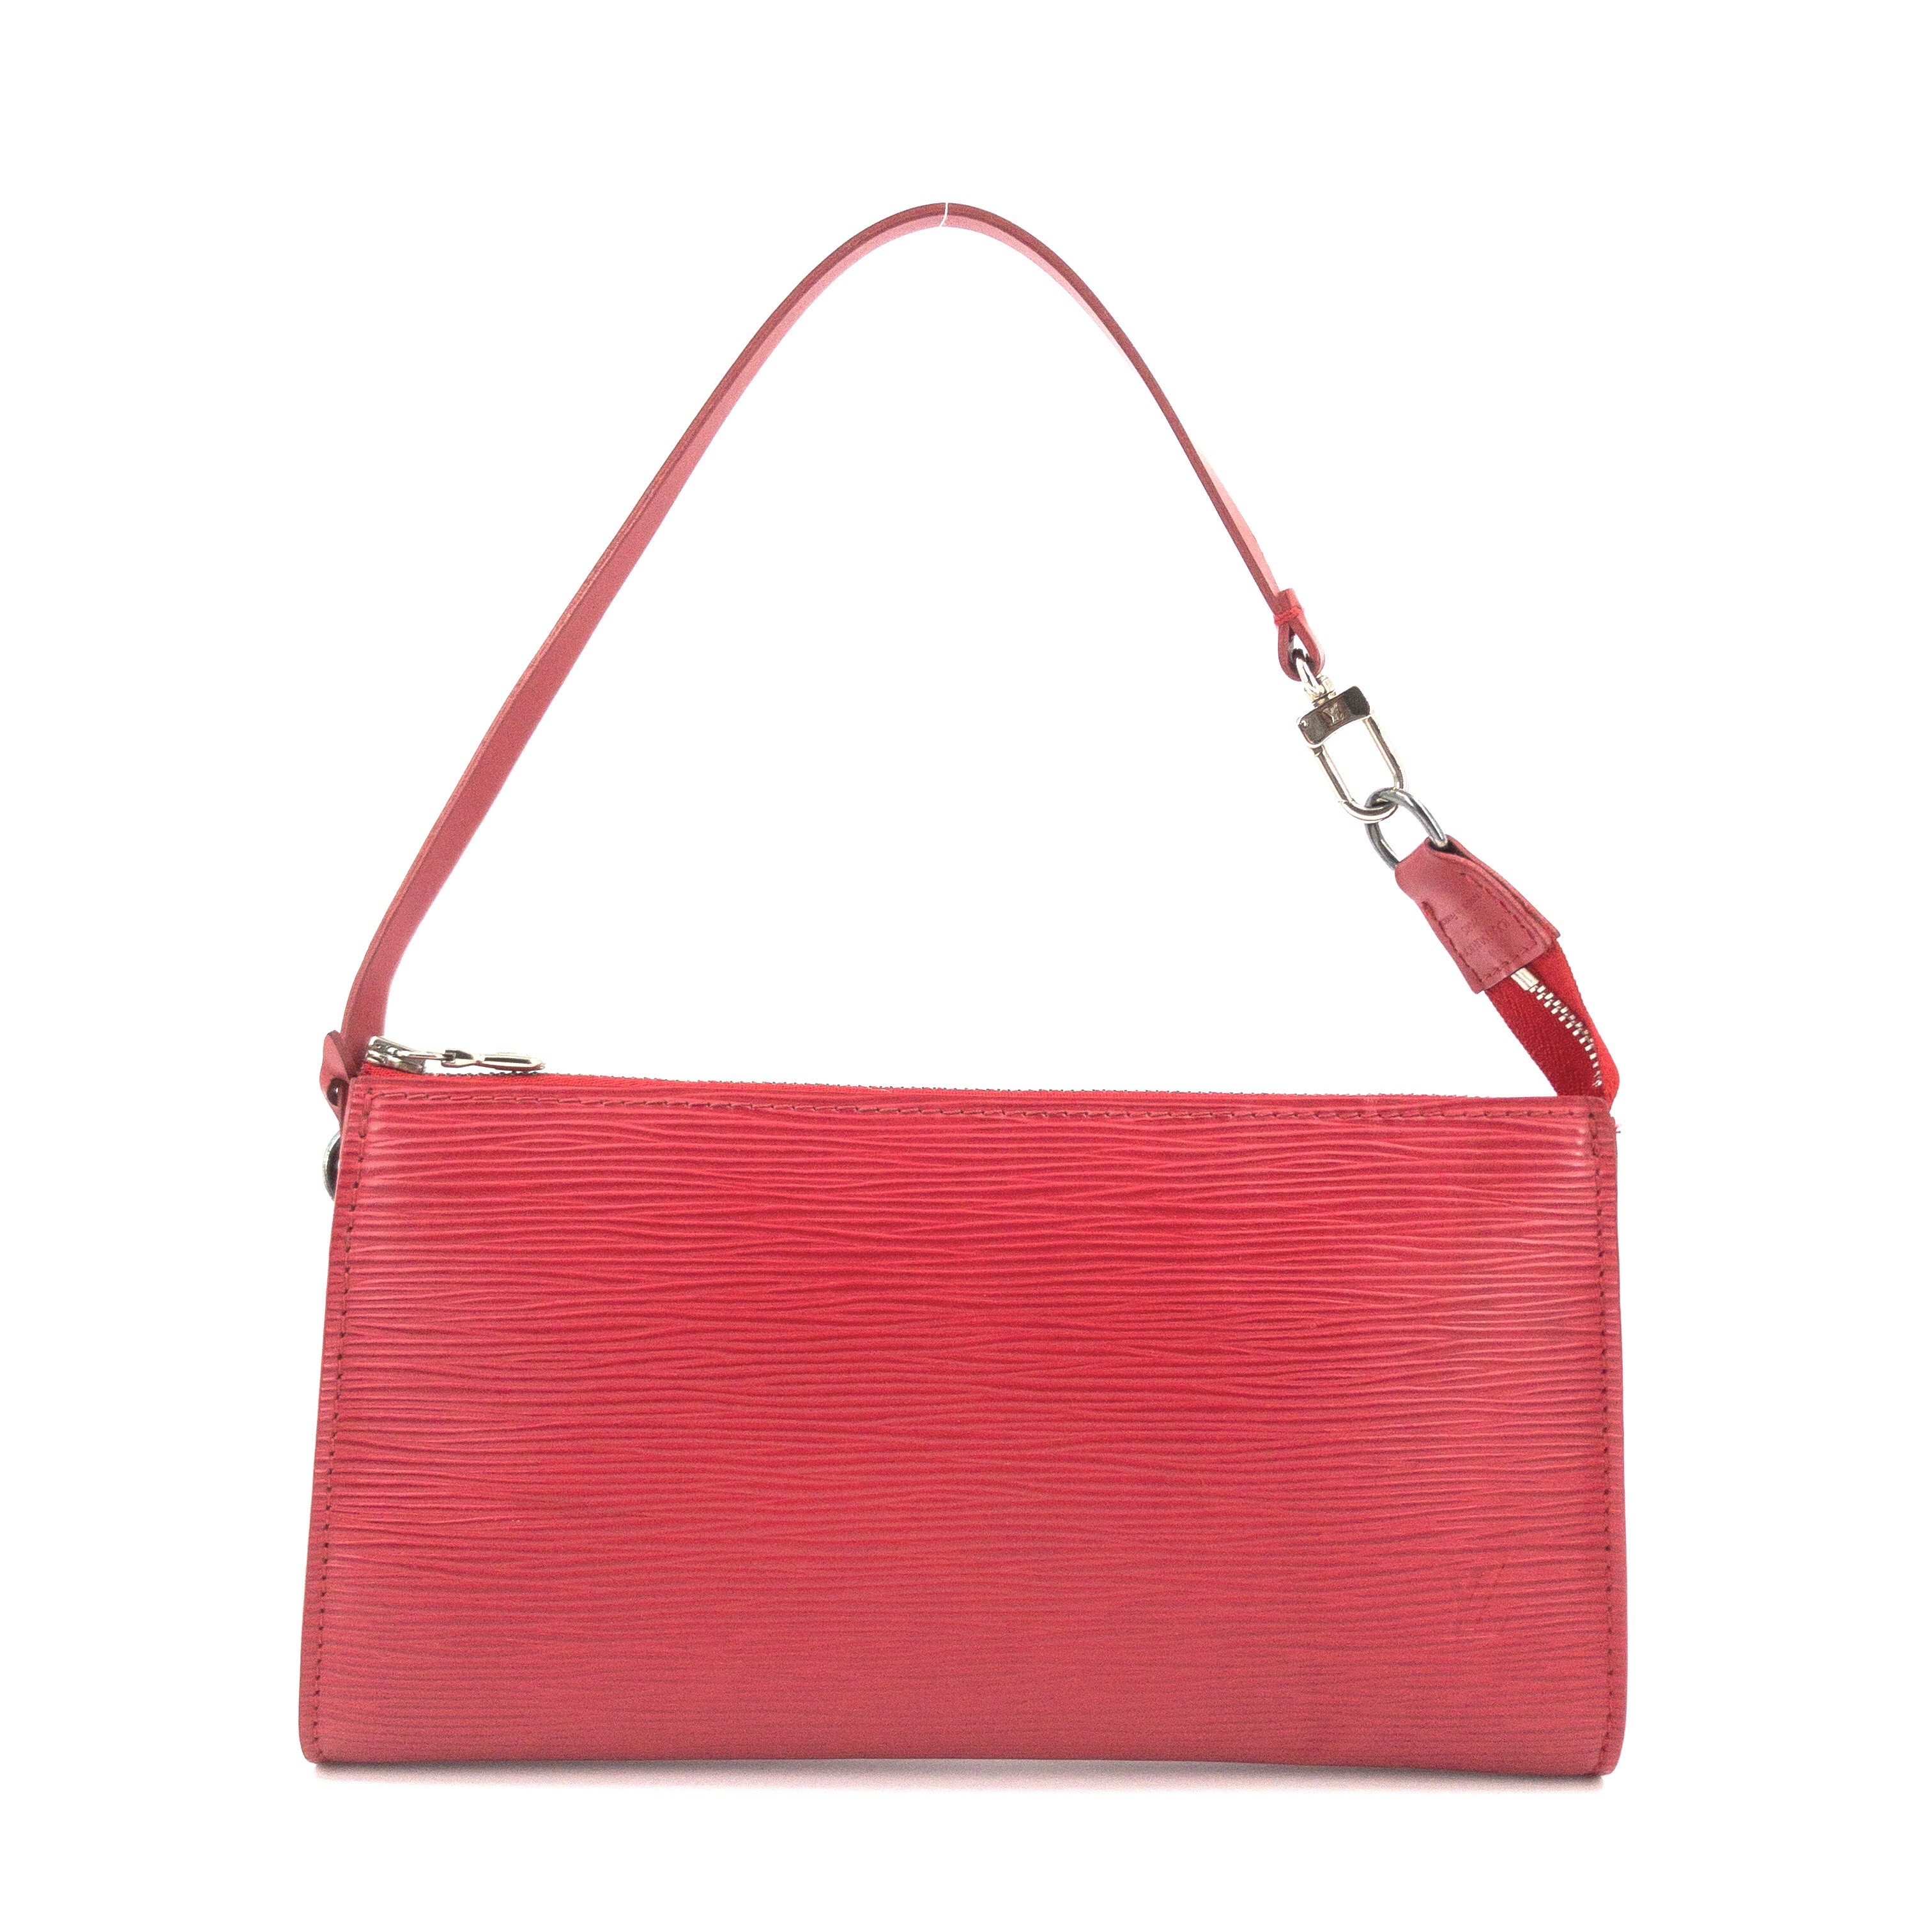 Louis Vuitton Red Epi Leather Accessories Pochette 24 Bag (06)